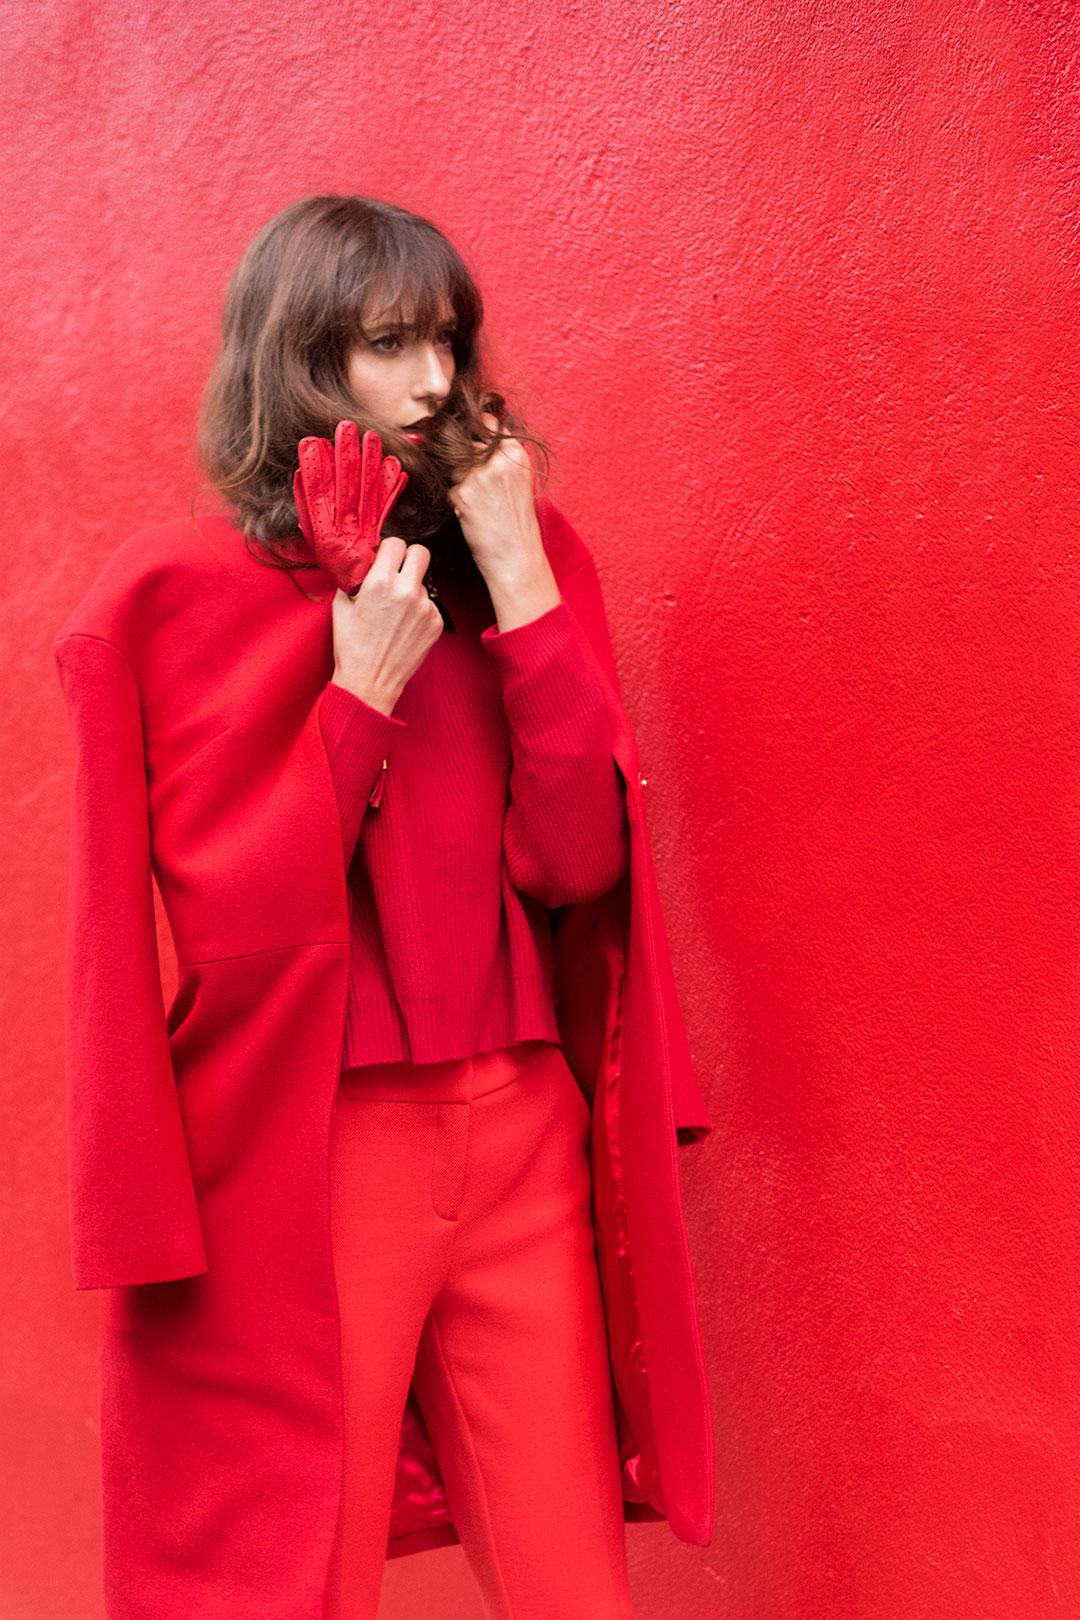 red-bow-tie-guerlain-streetstyle-mitmeblog-web-07